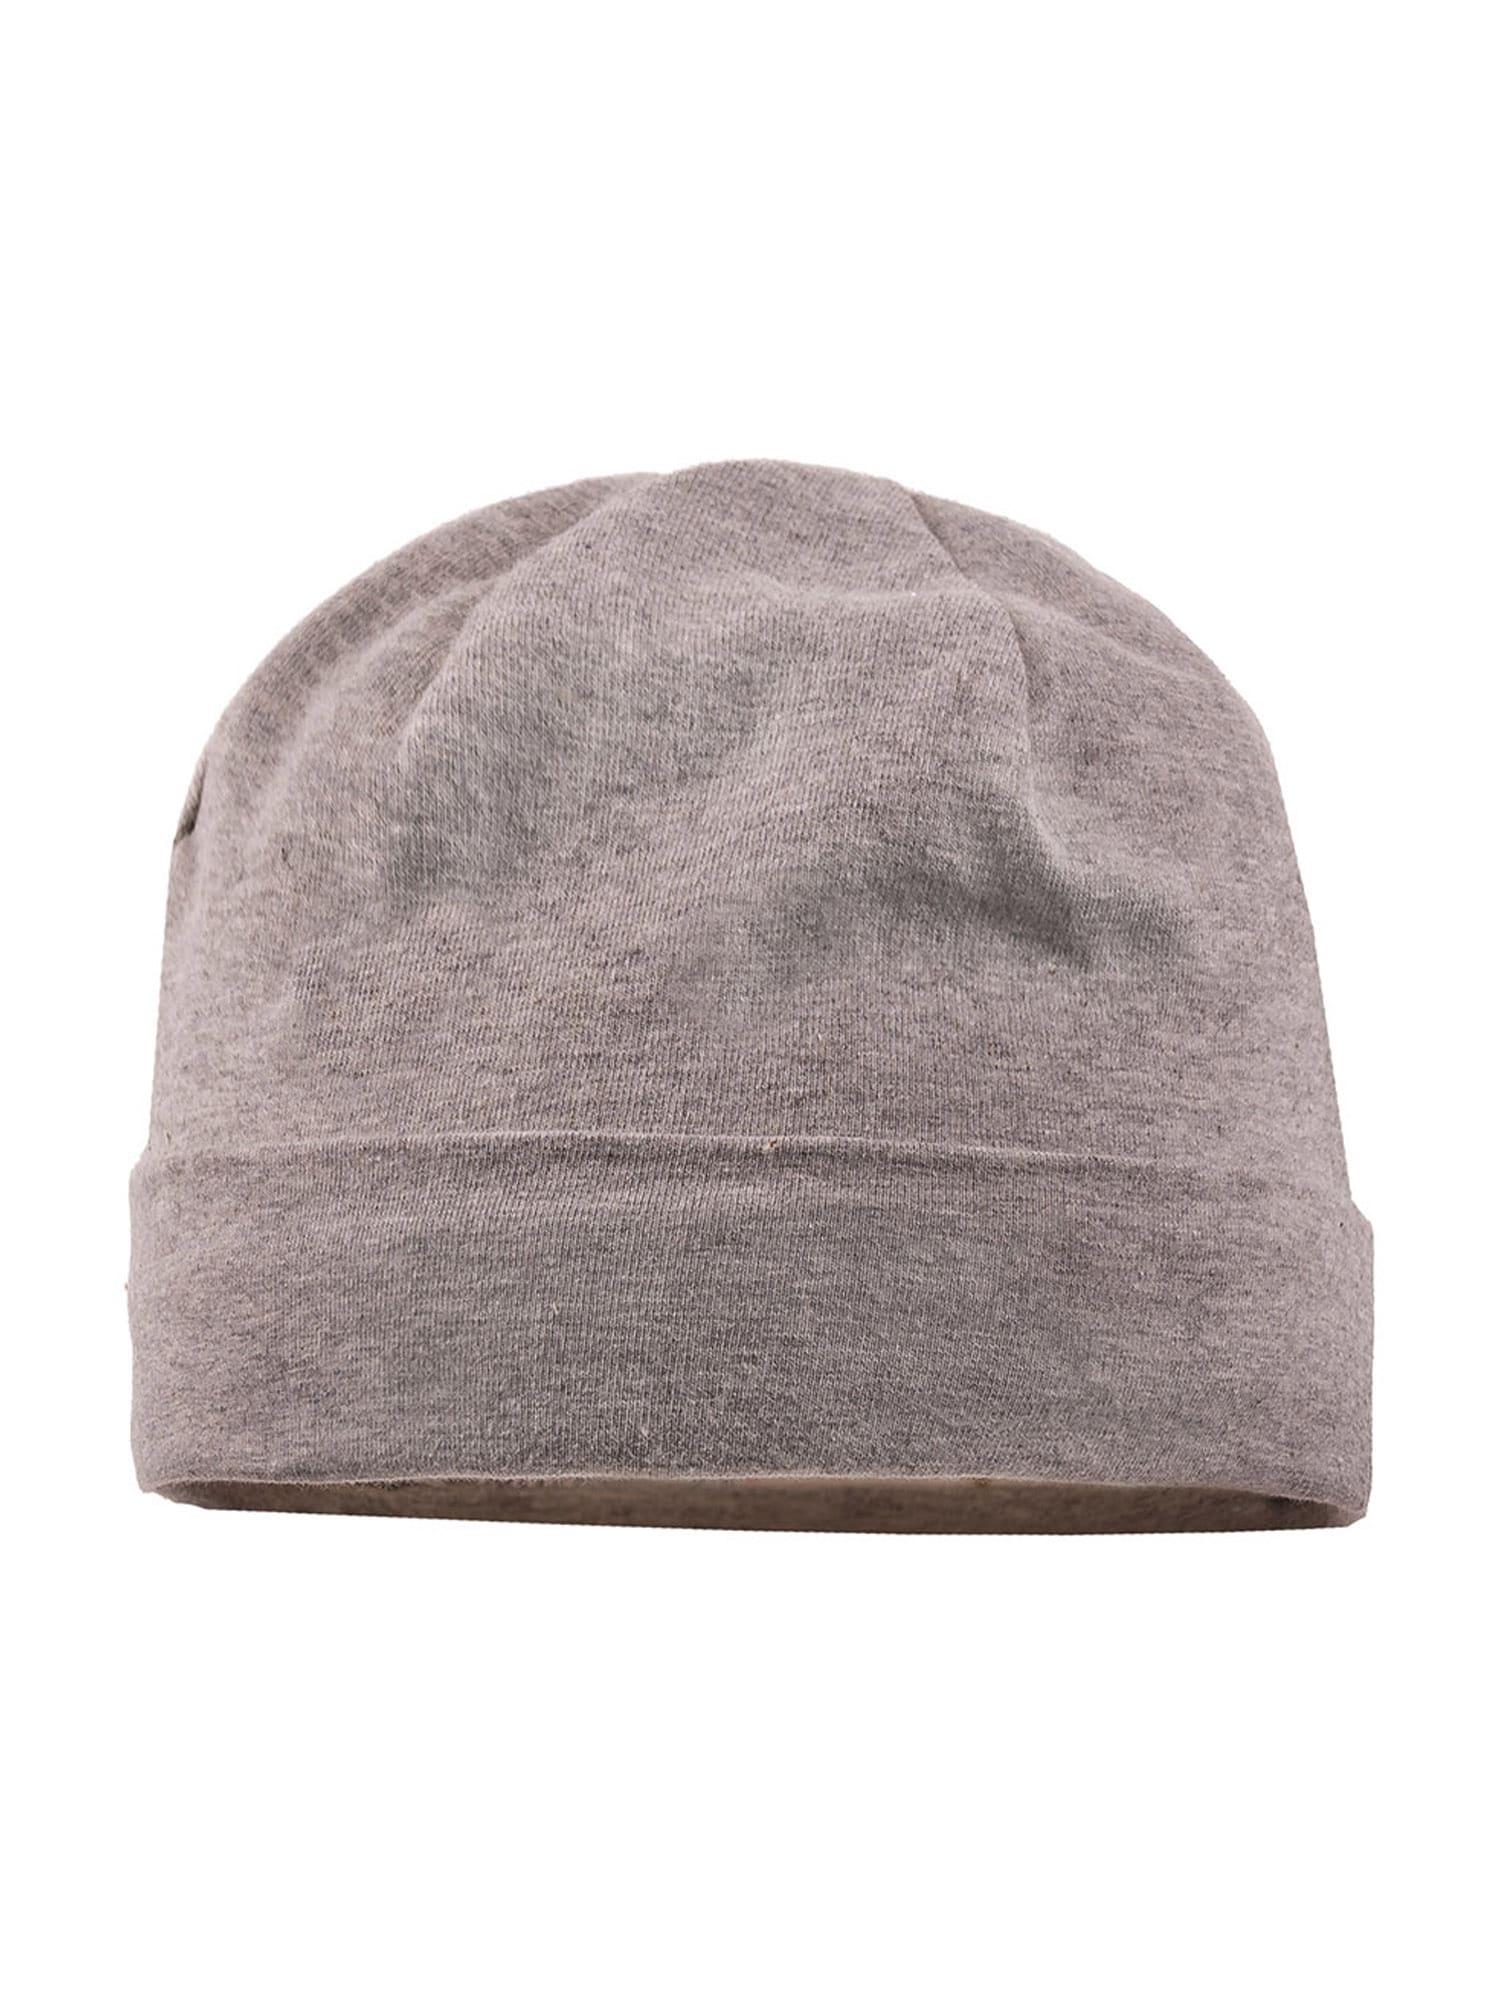 MAXIMO Megzta kepurė rusvai pilka